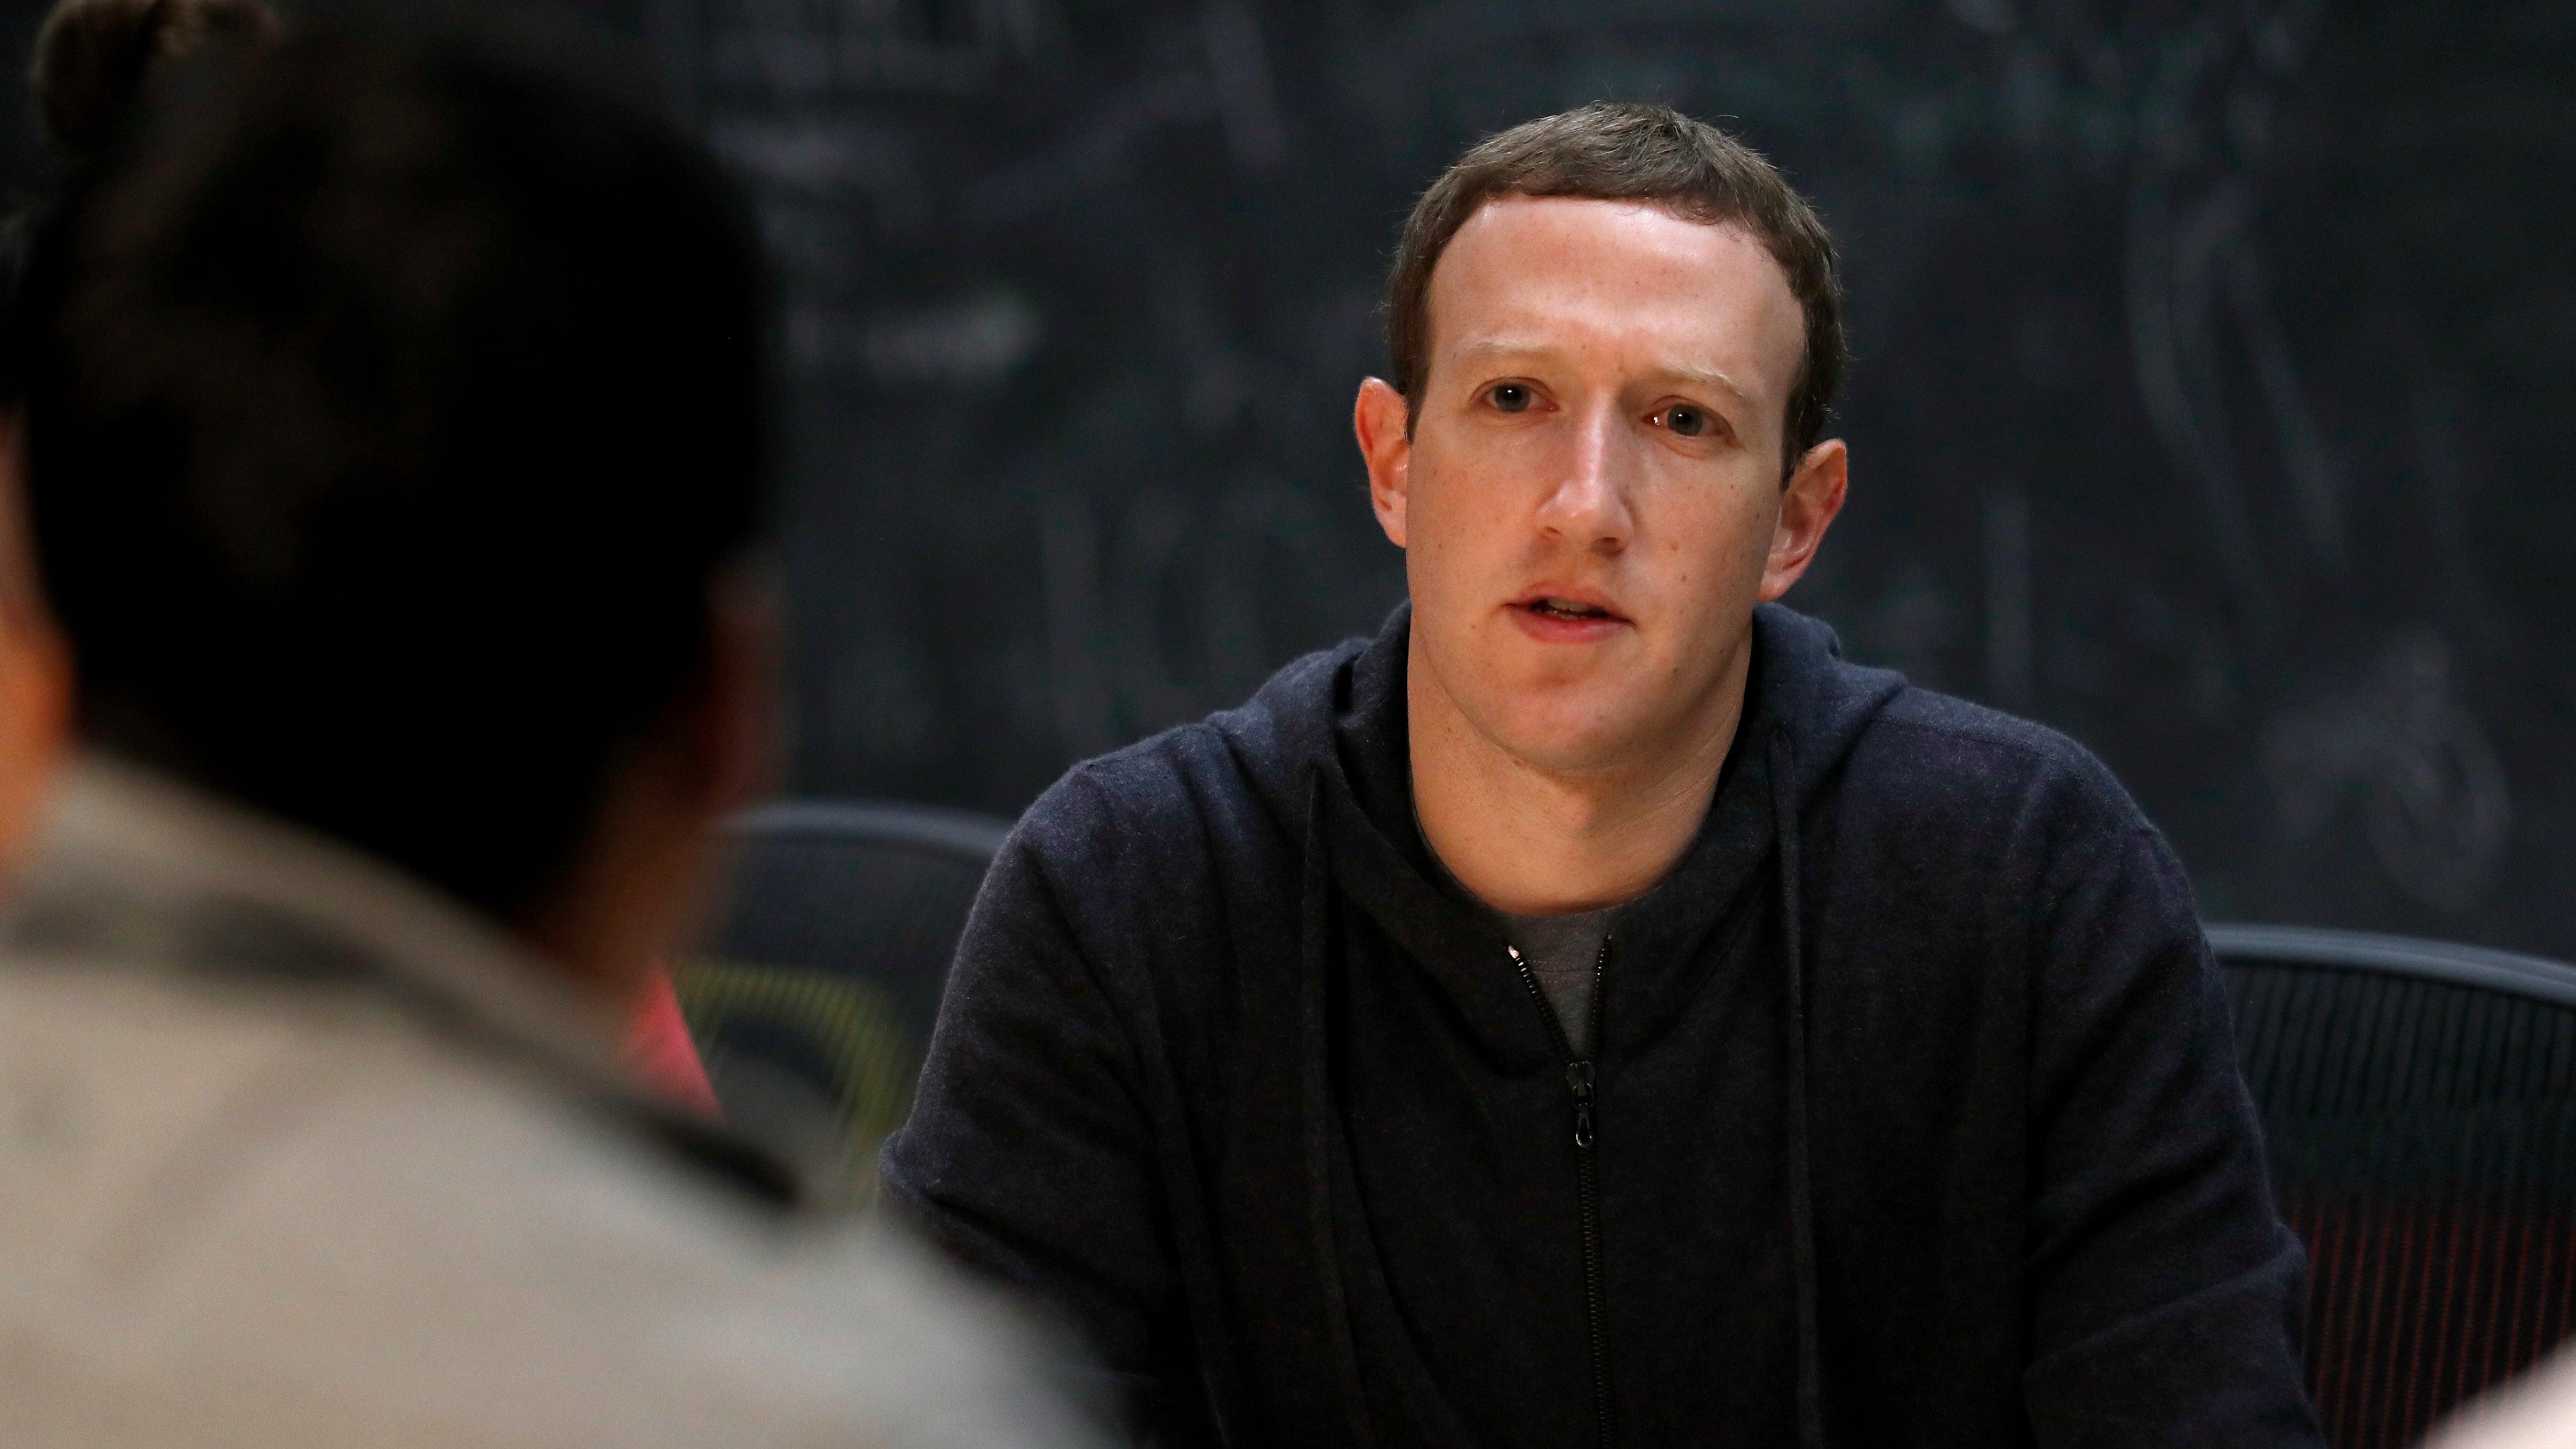 Mark Zuckerberg Fails To Apologise